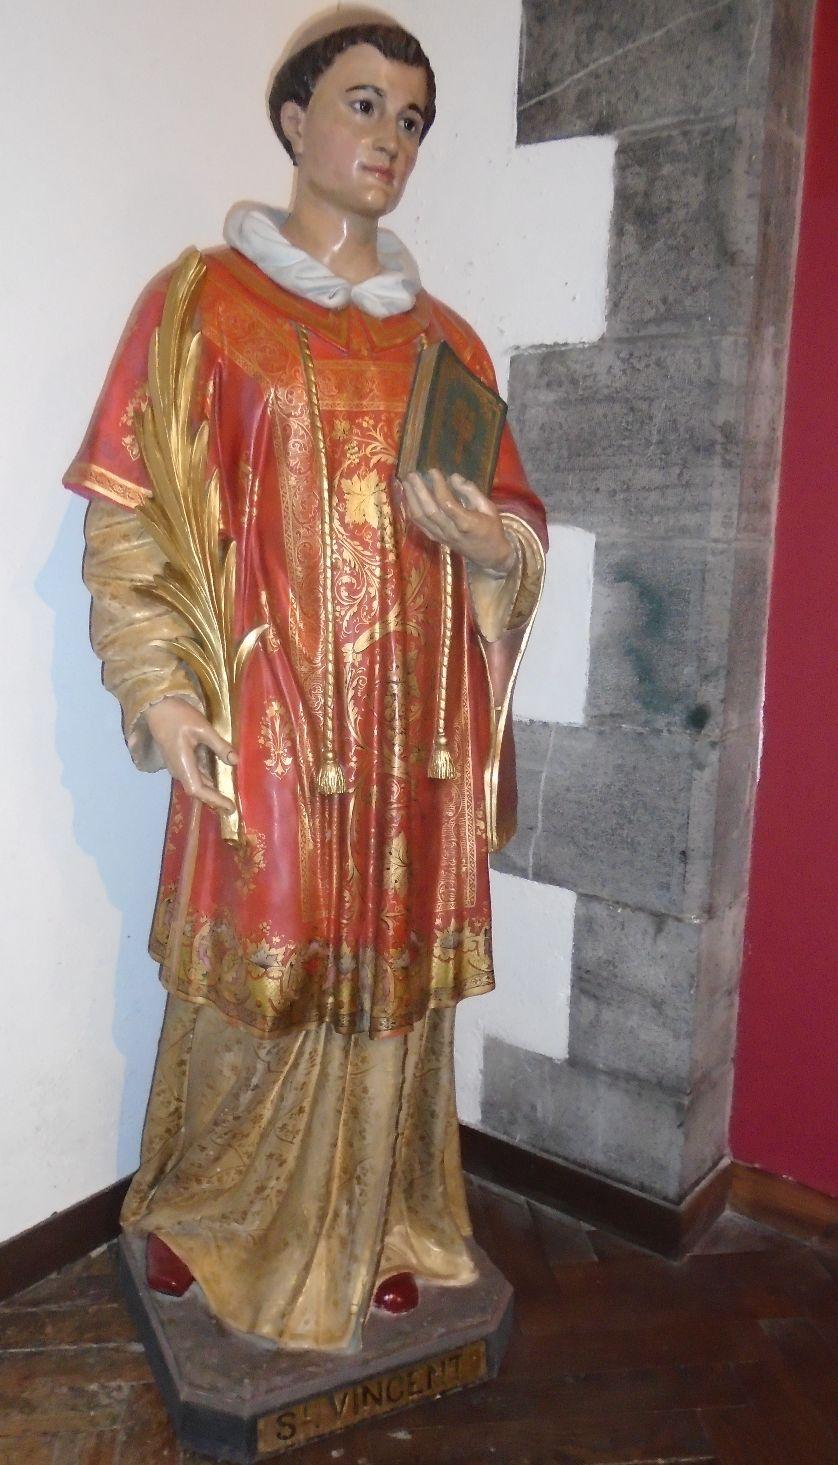 Saint Vincent Hendaye